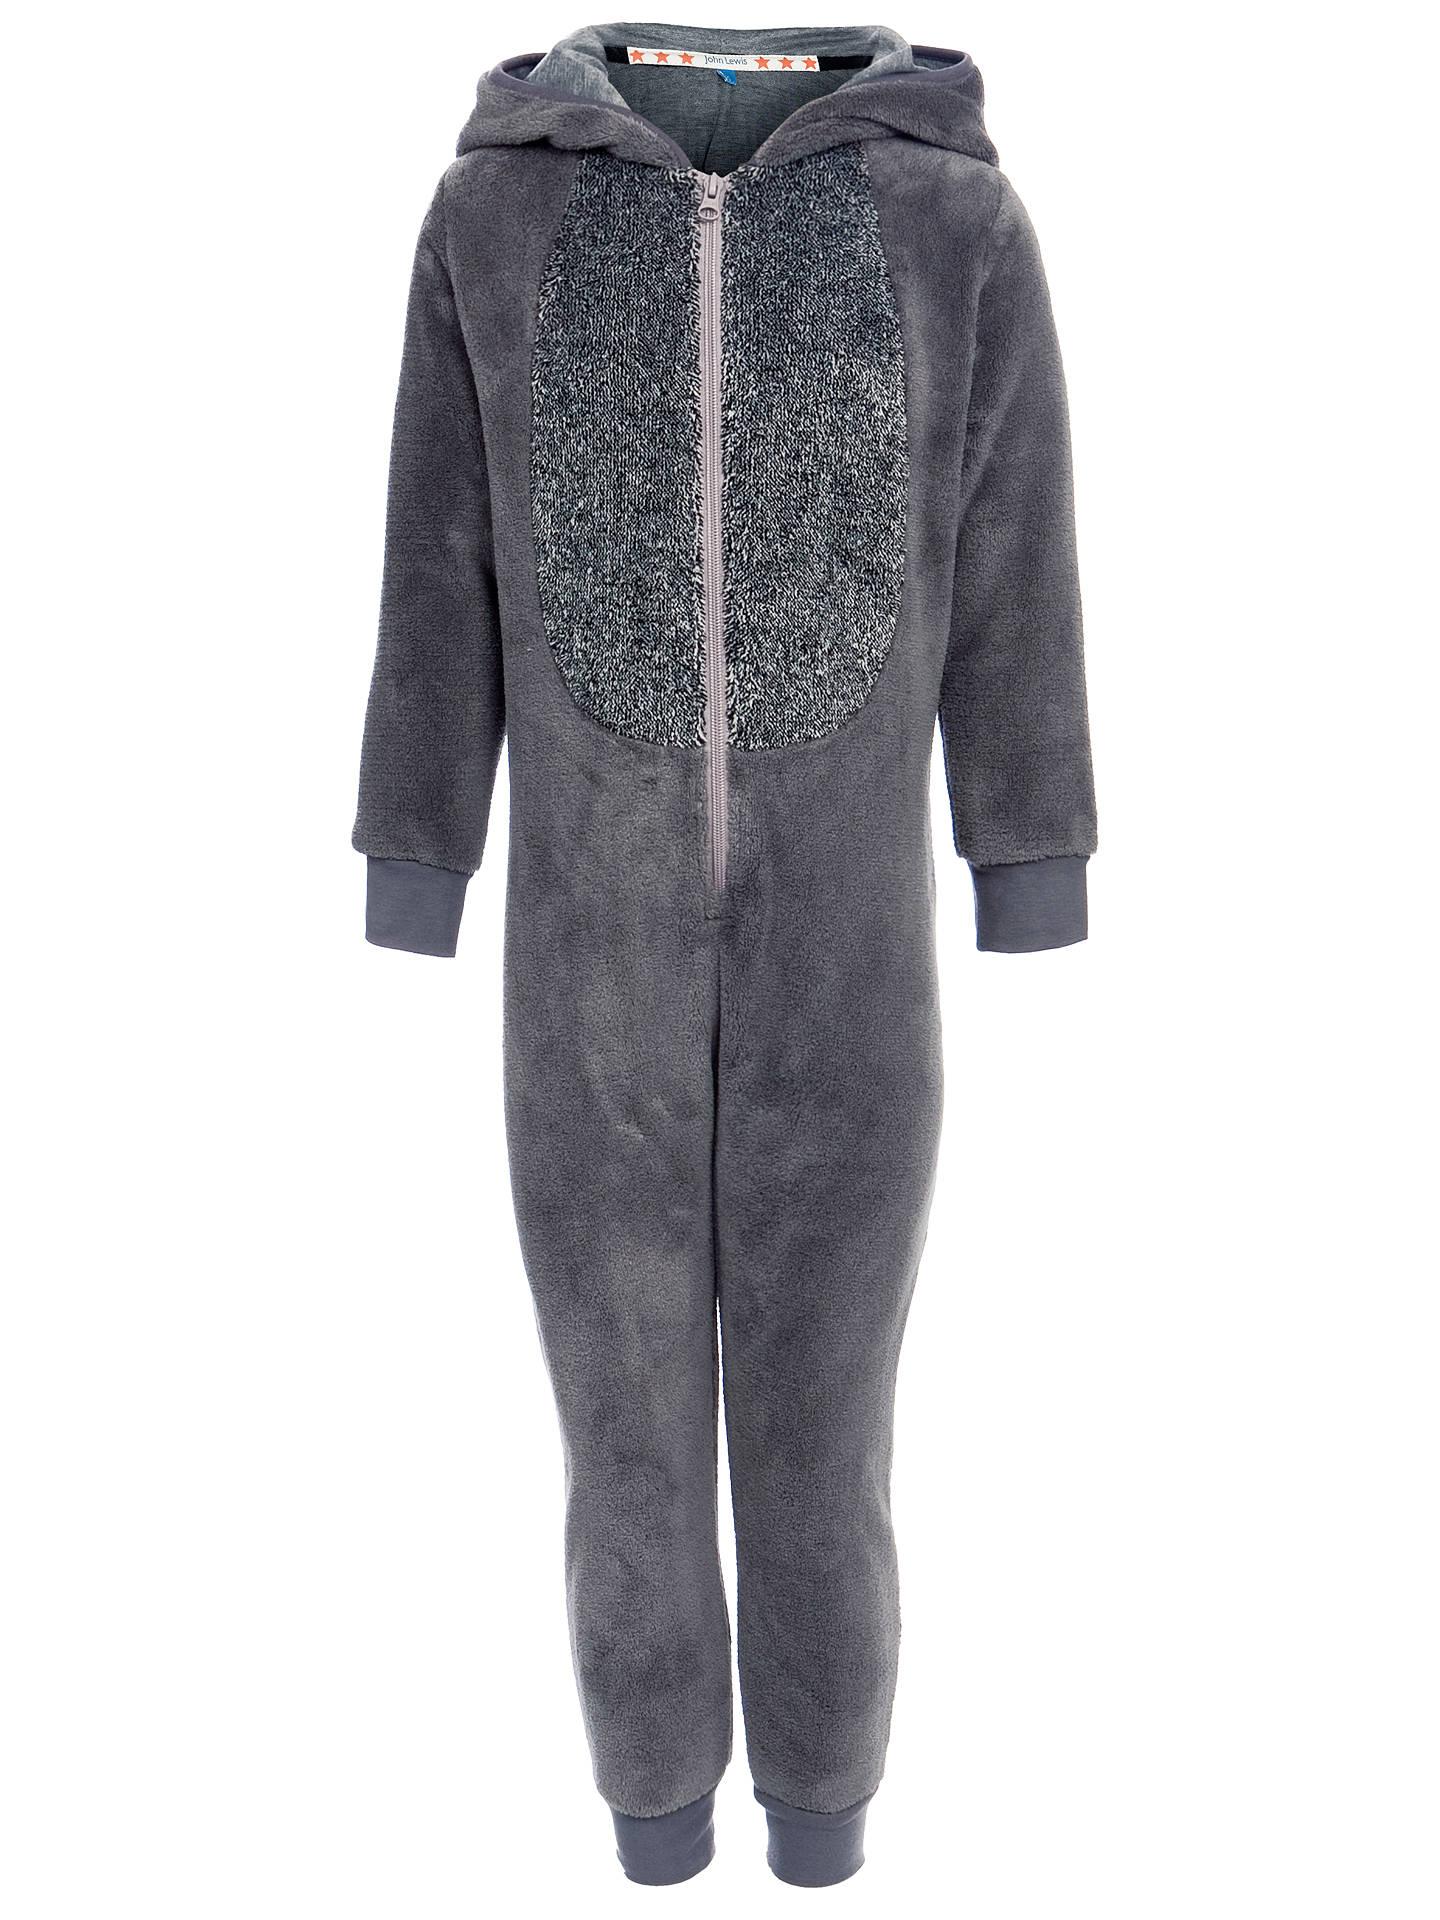 bcb31b6a7648 Buy John Lewis Raccoon Fleece Onesie